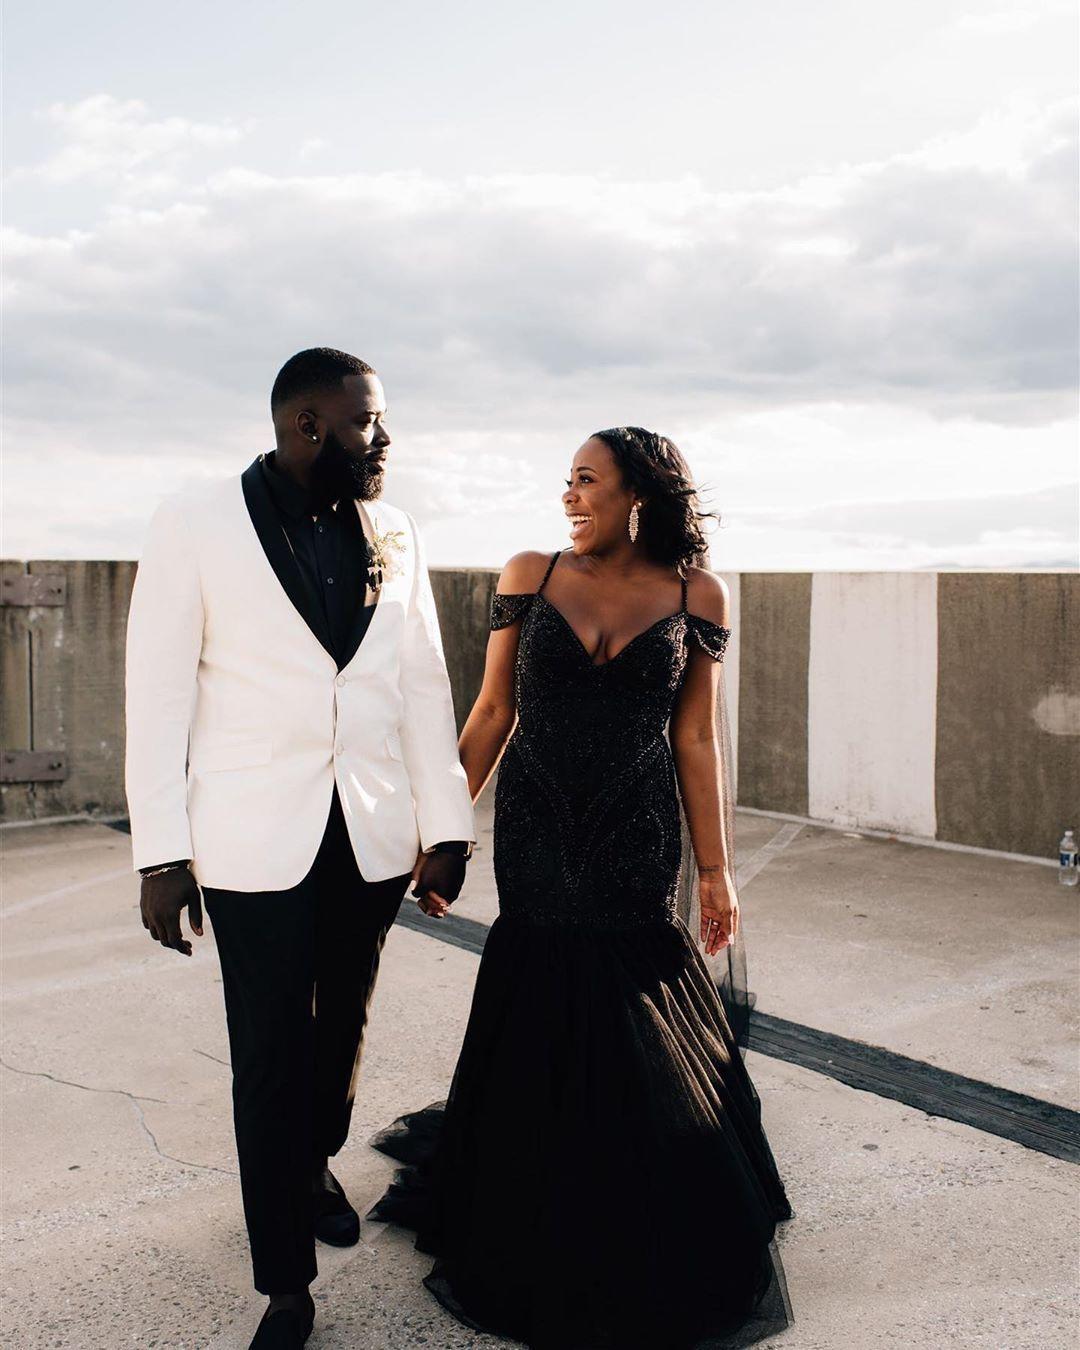 Halloween Party Asheville 2020 Black Wedding Dress   Asheville Elopement   Offbeat Wedding in